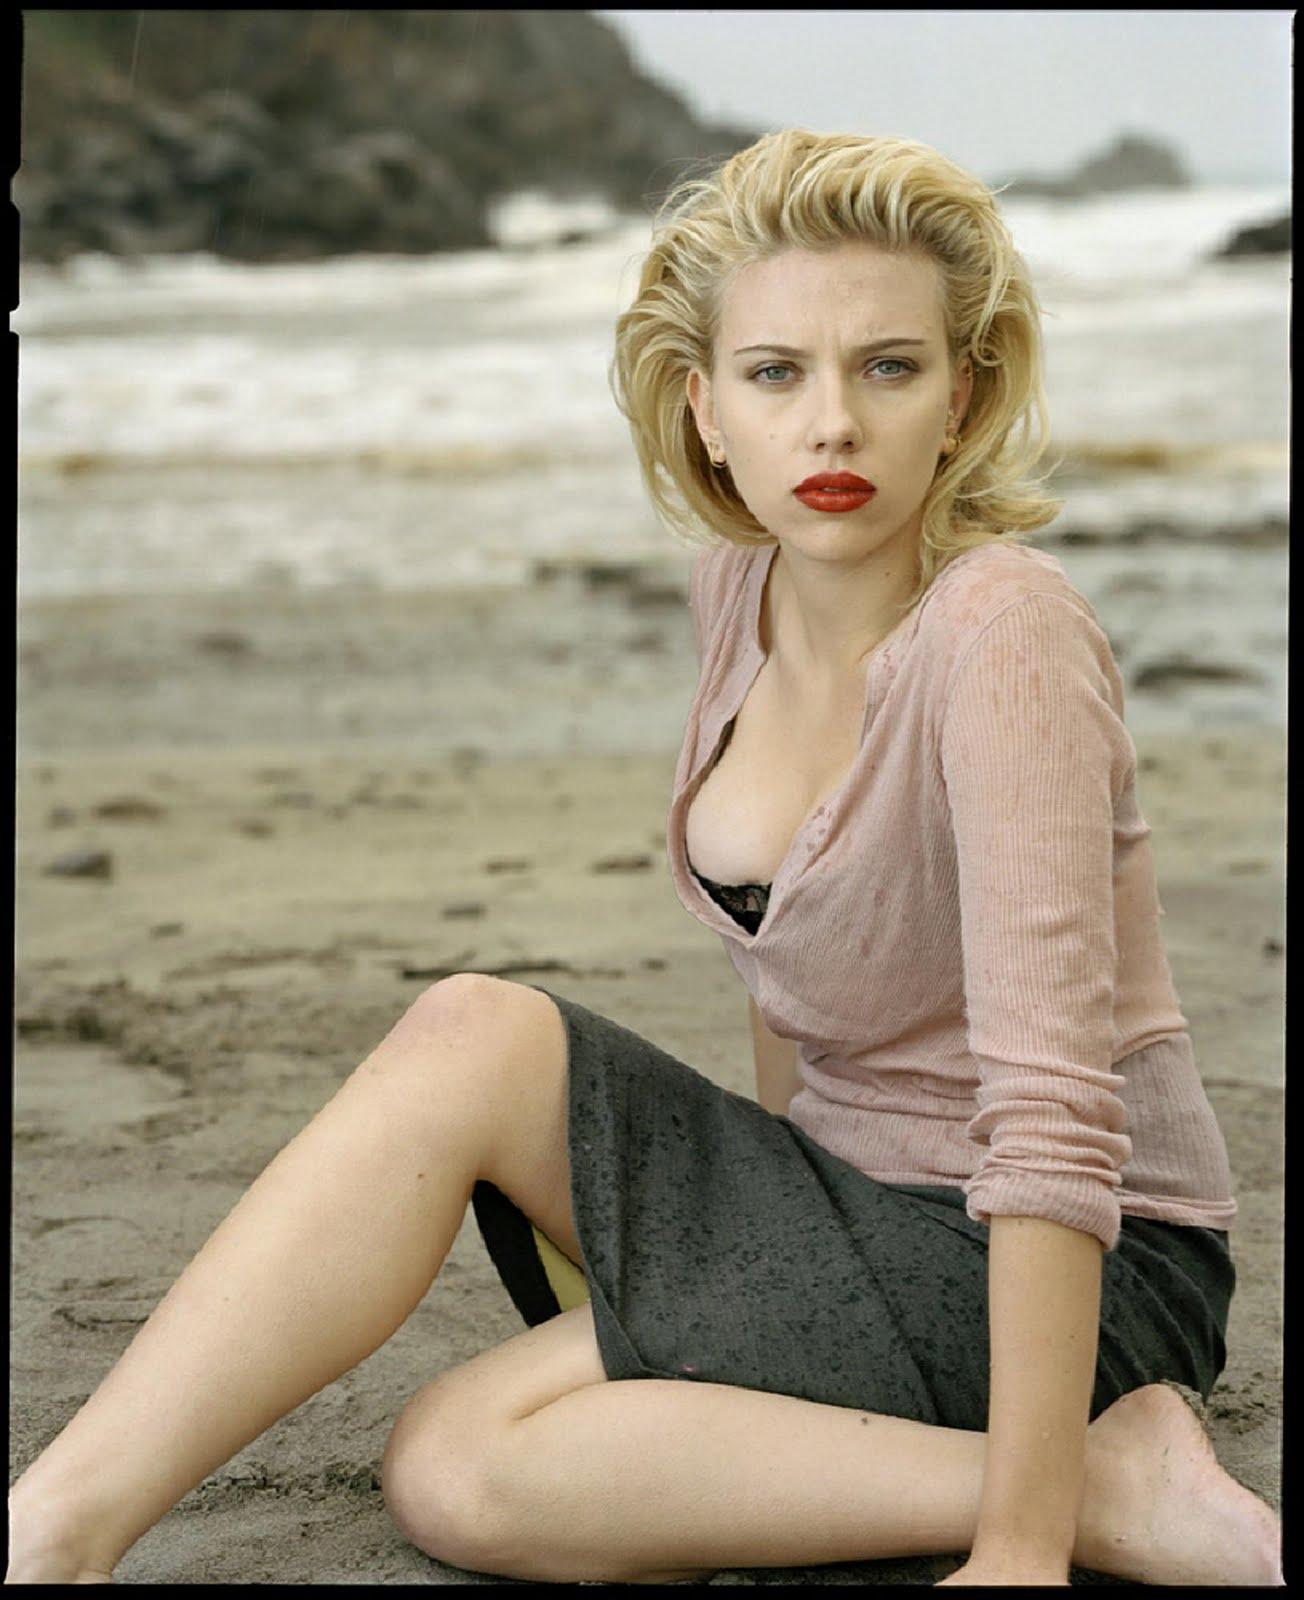 DRAGON: Scarlett Johansson / Our Miss Scarlett Scarlett